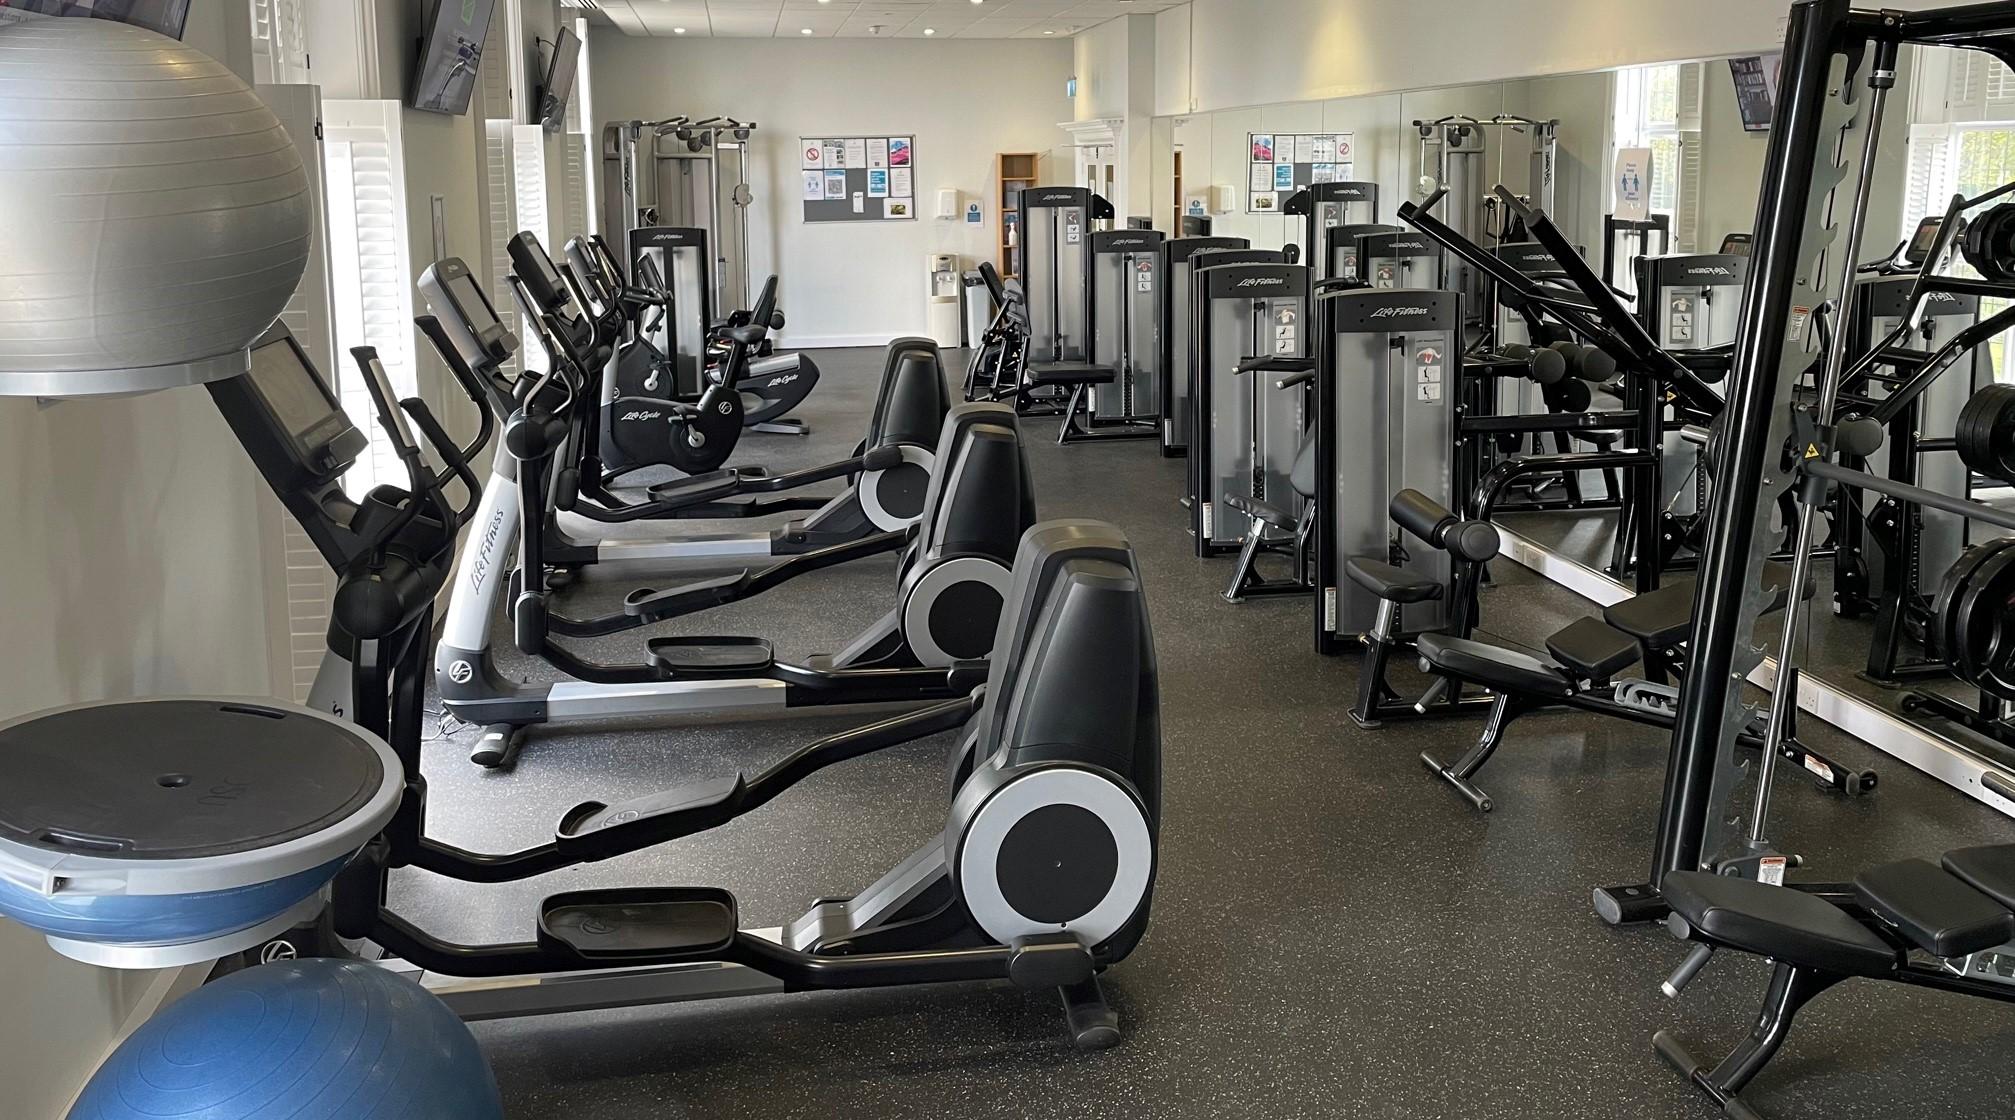 Socially distanced gym